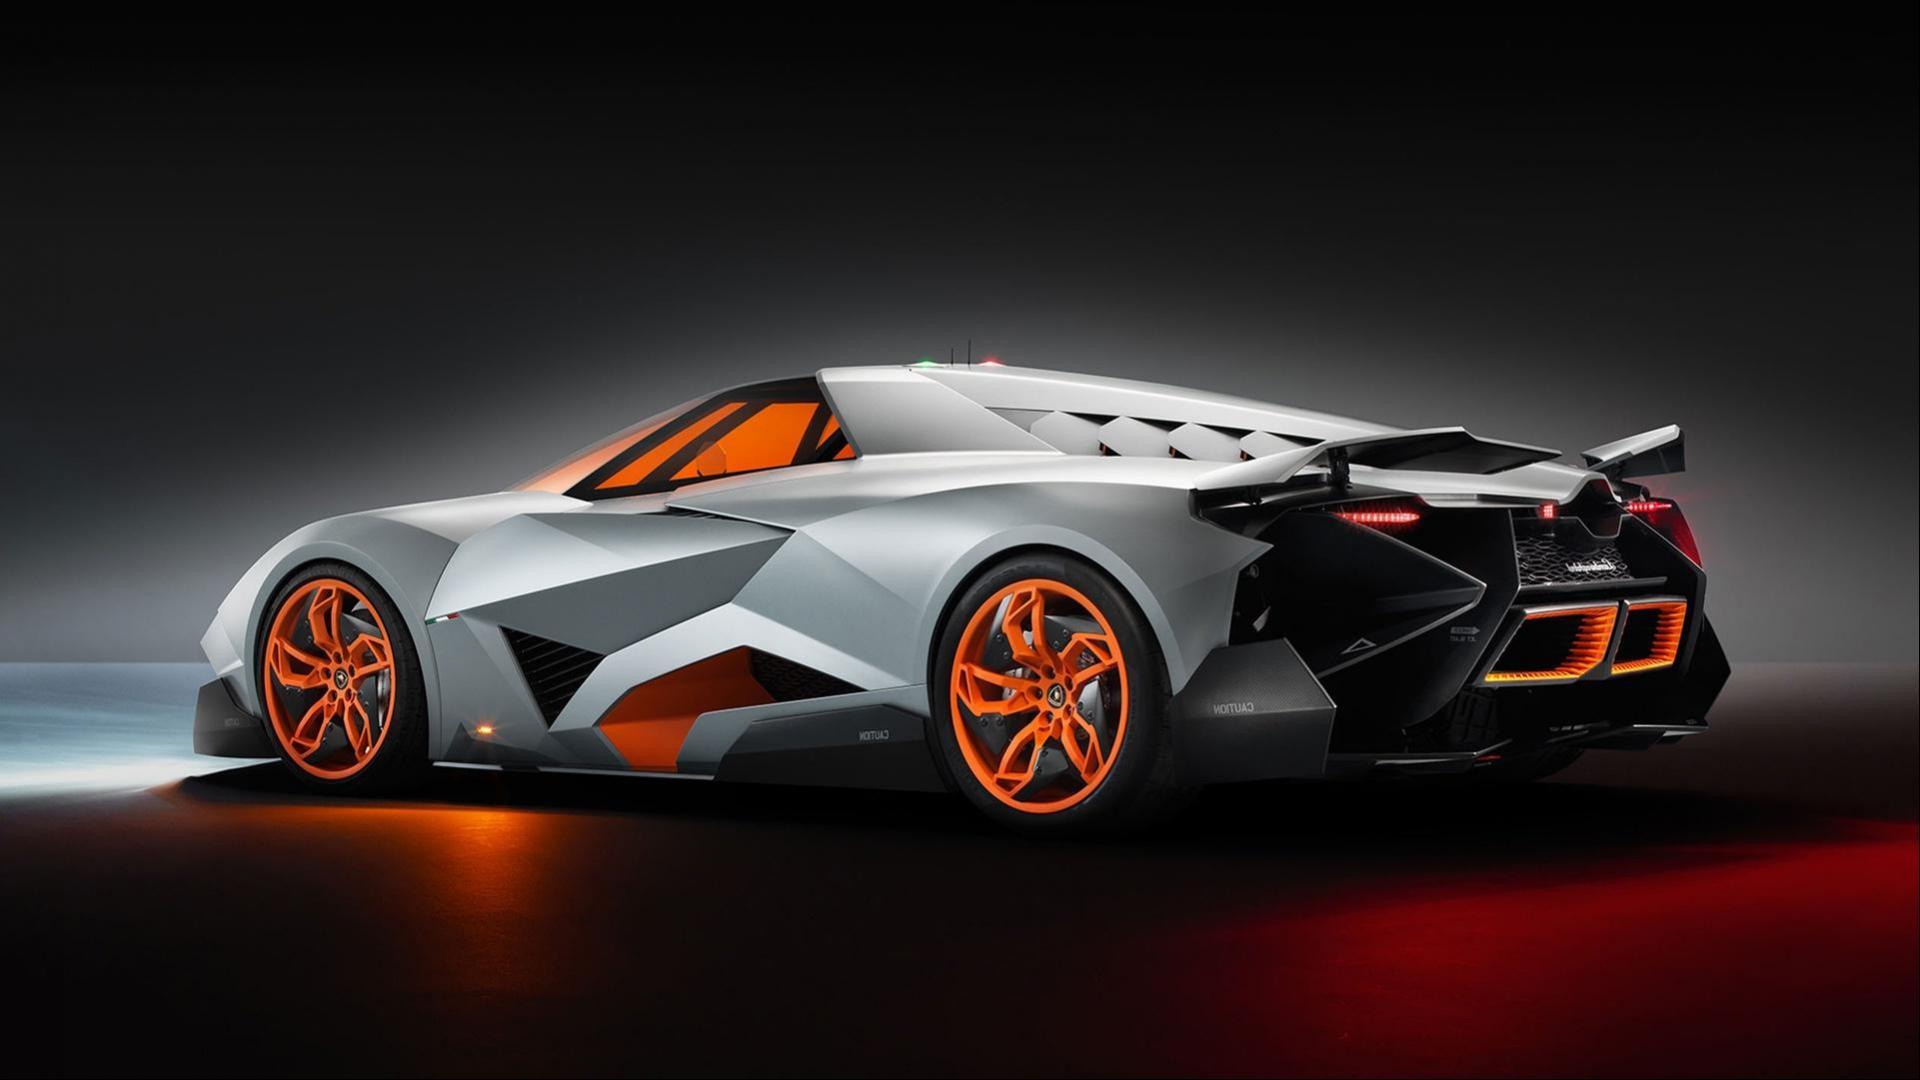 Cool Modified Cars Wallpapers Lamborghini Egoista Sinister Car That Really Selfish